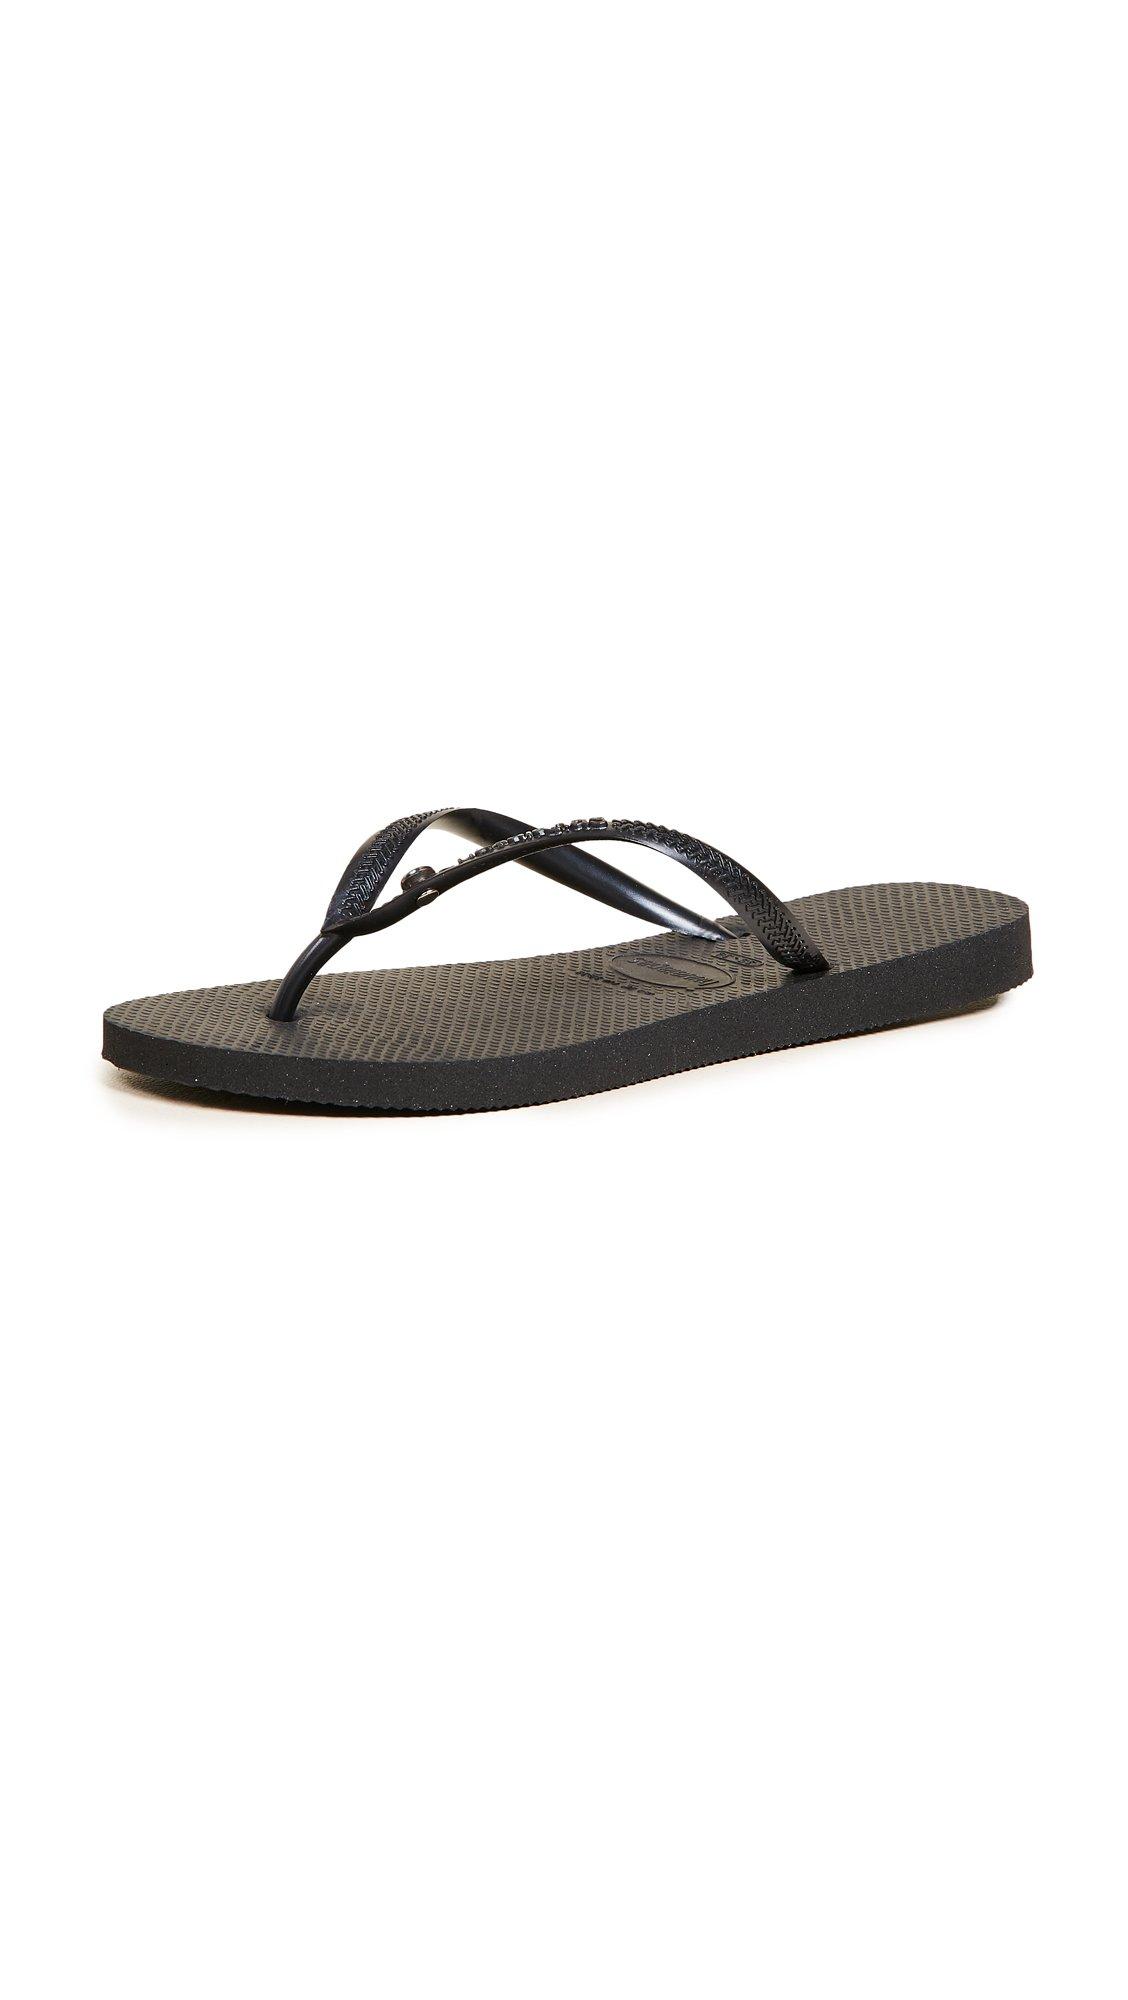 Havaianas Women's Slim Flip Flop Sandals, Crystal Glamour SW,Black,37/38 BR (7-8 M US)